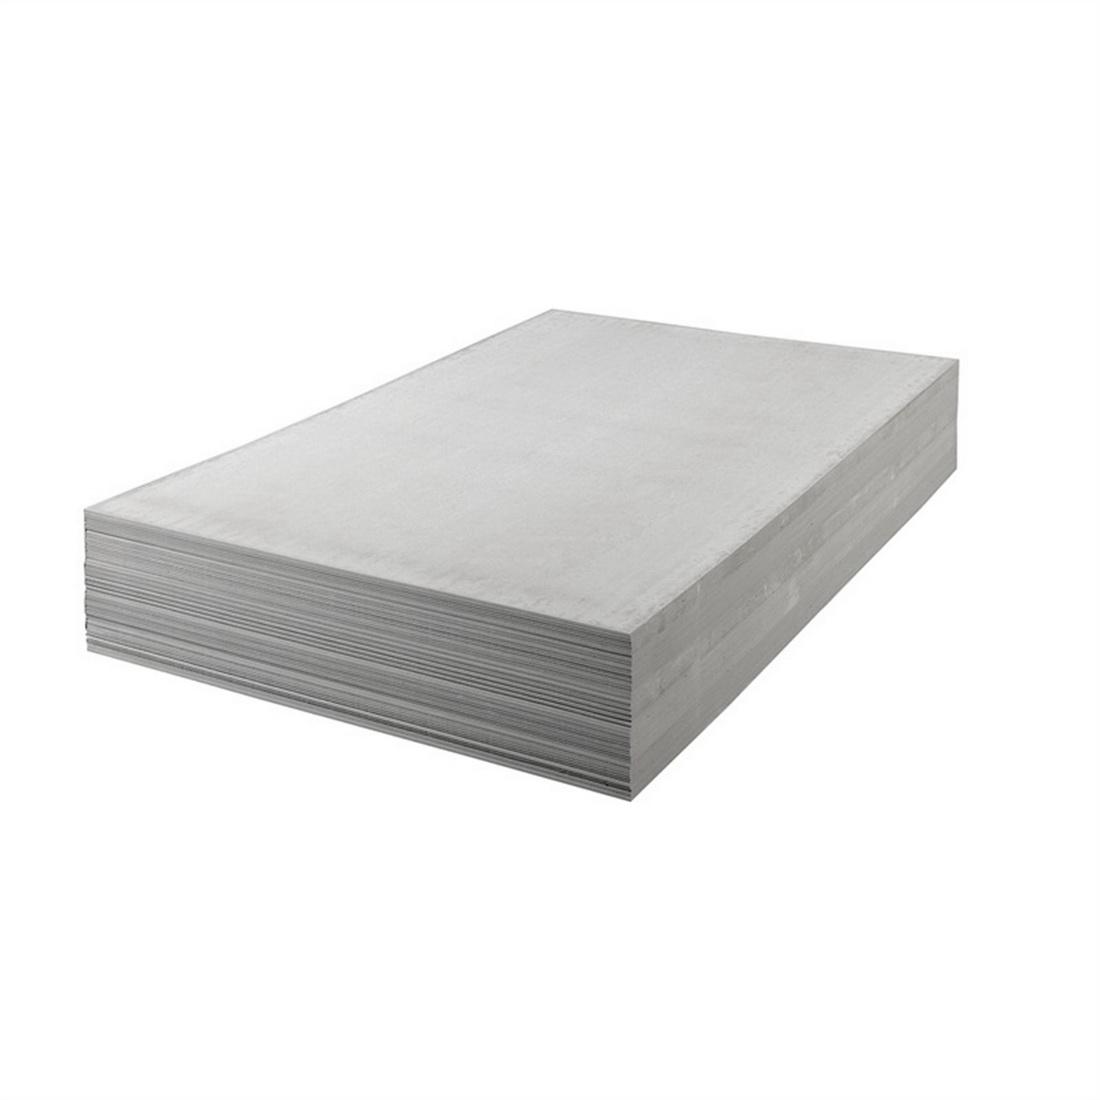 HardieFlex Sheet 2400 x 1200 x 7.5mm